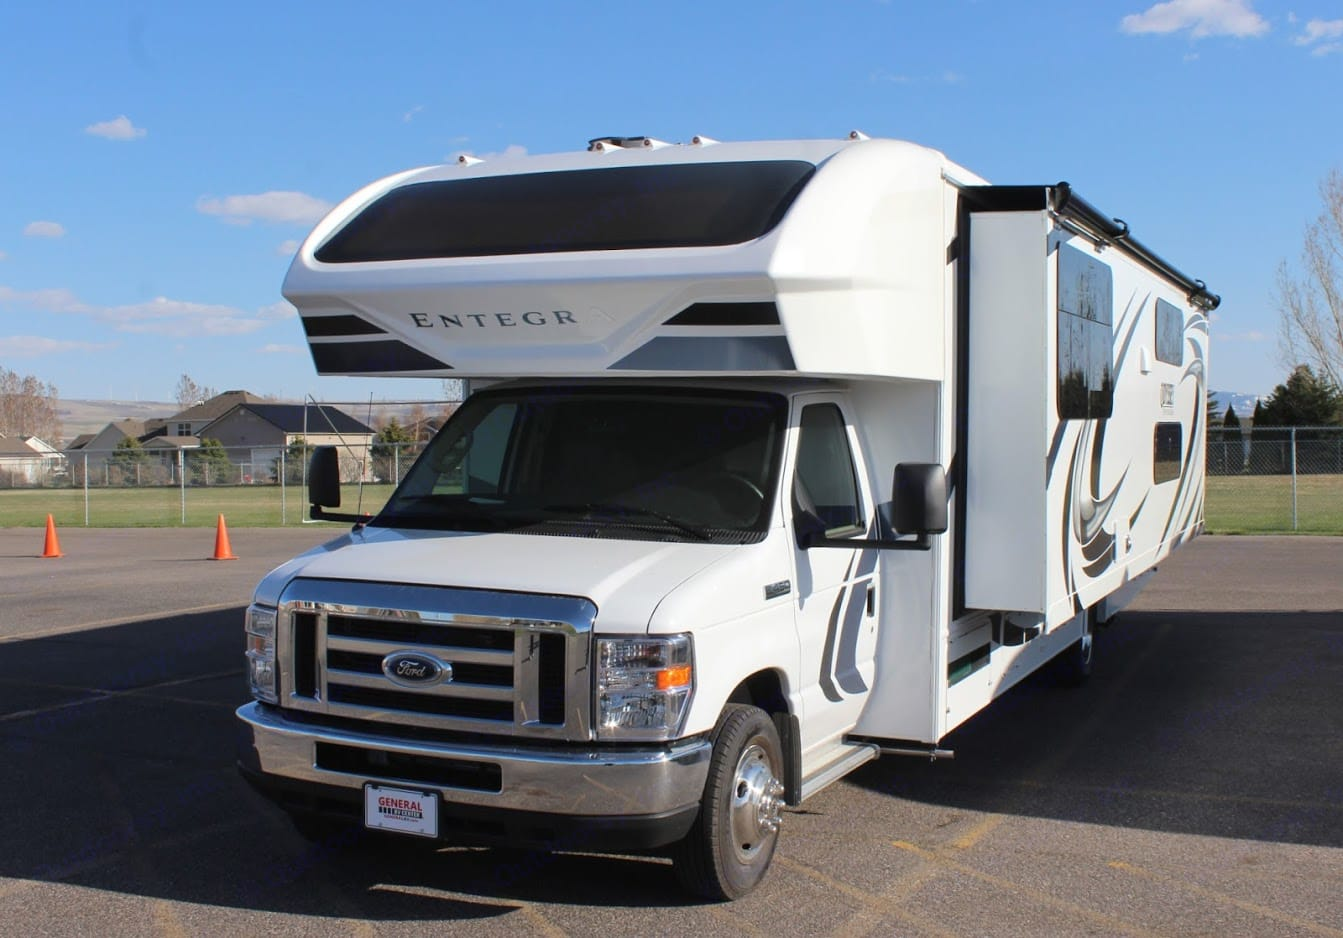 Entegra Coach Odyssey 31 F 2020